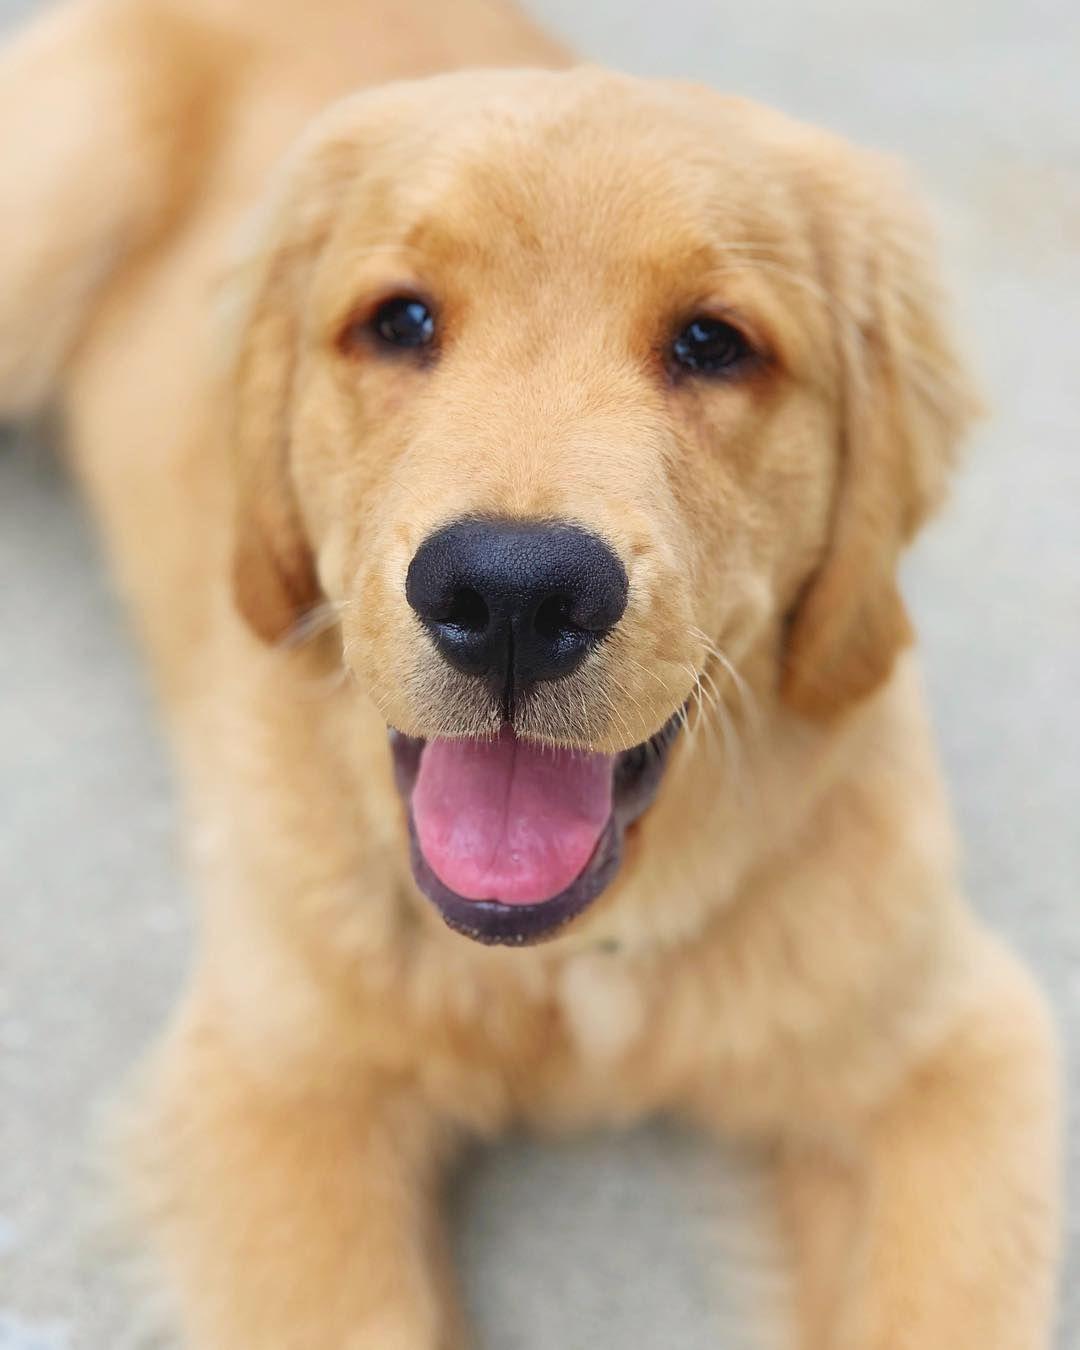 Tucker Bear On Instagram A Super Happy Puppy After Tucker